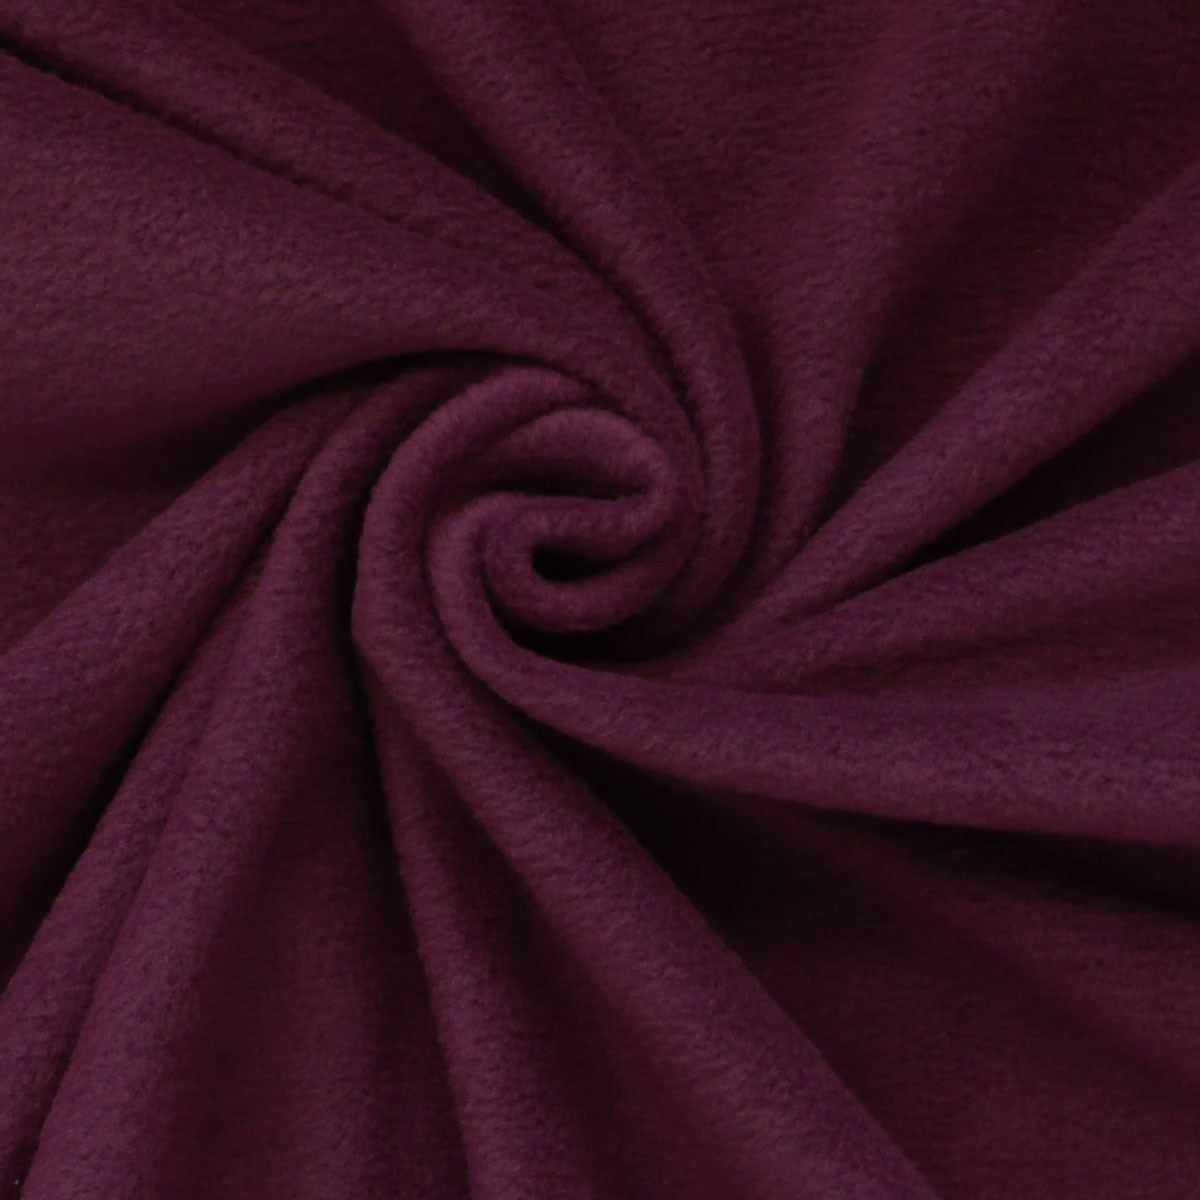 polar fleece stoffe fleecestoff brombeere stoffe stoffe uni fleece. Black Bedroom Furniture Sets. Home Design Ideas